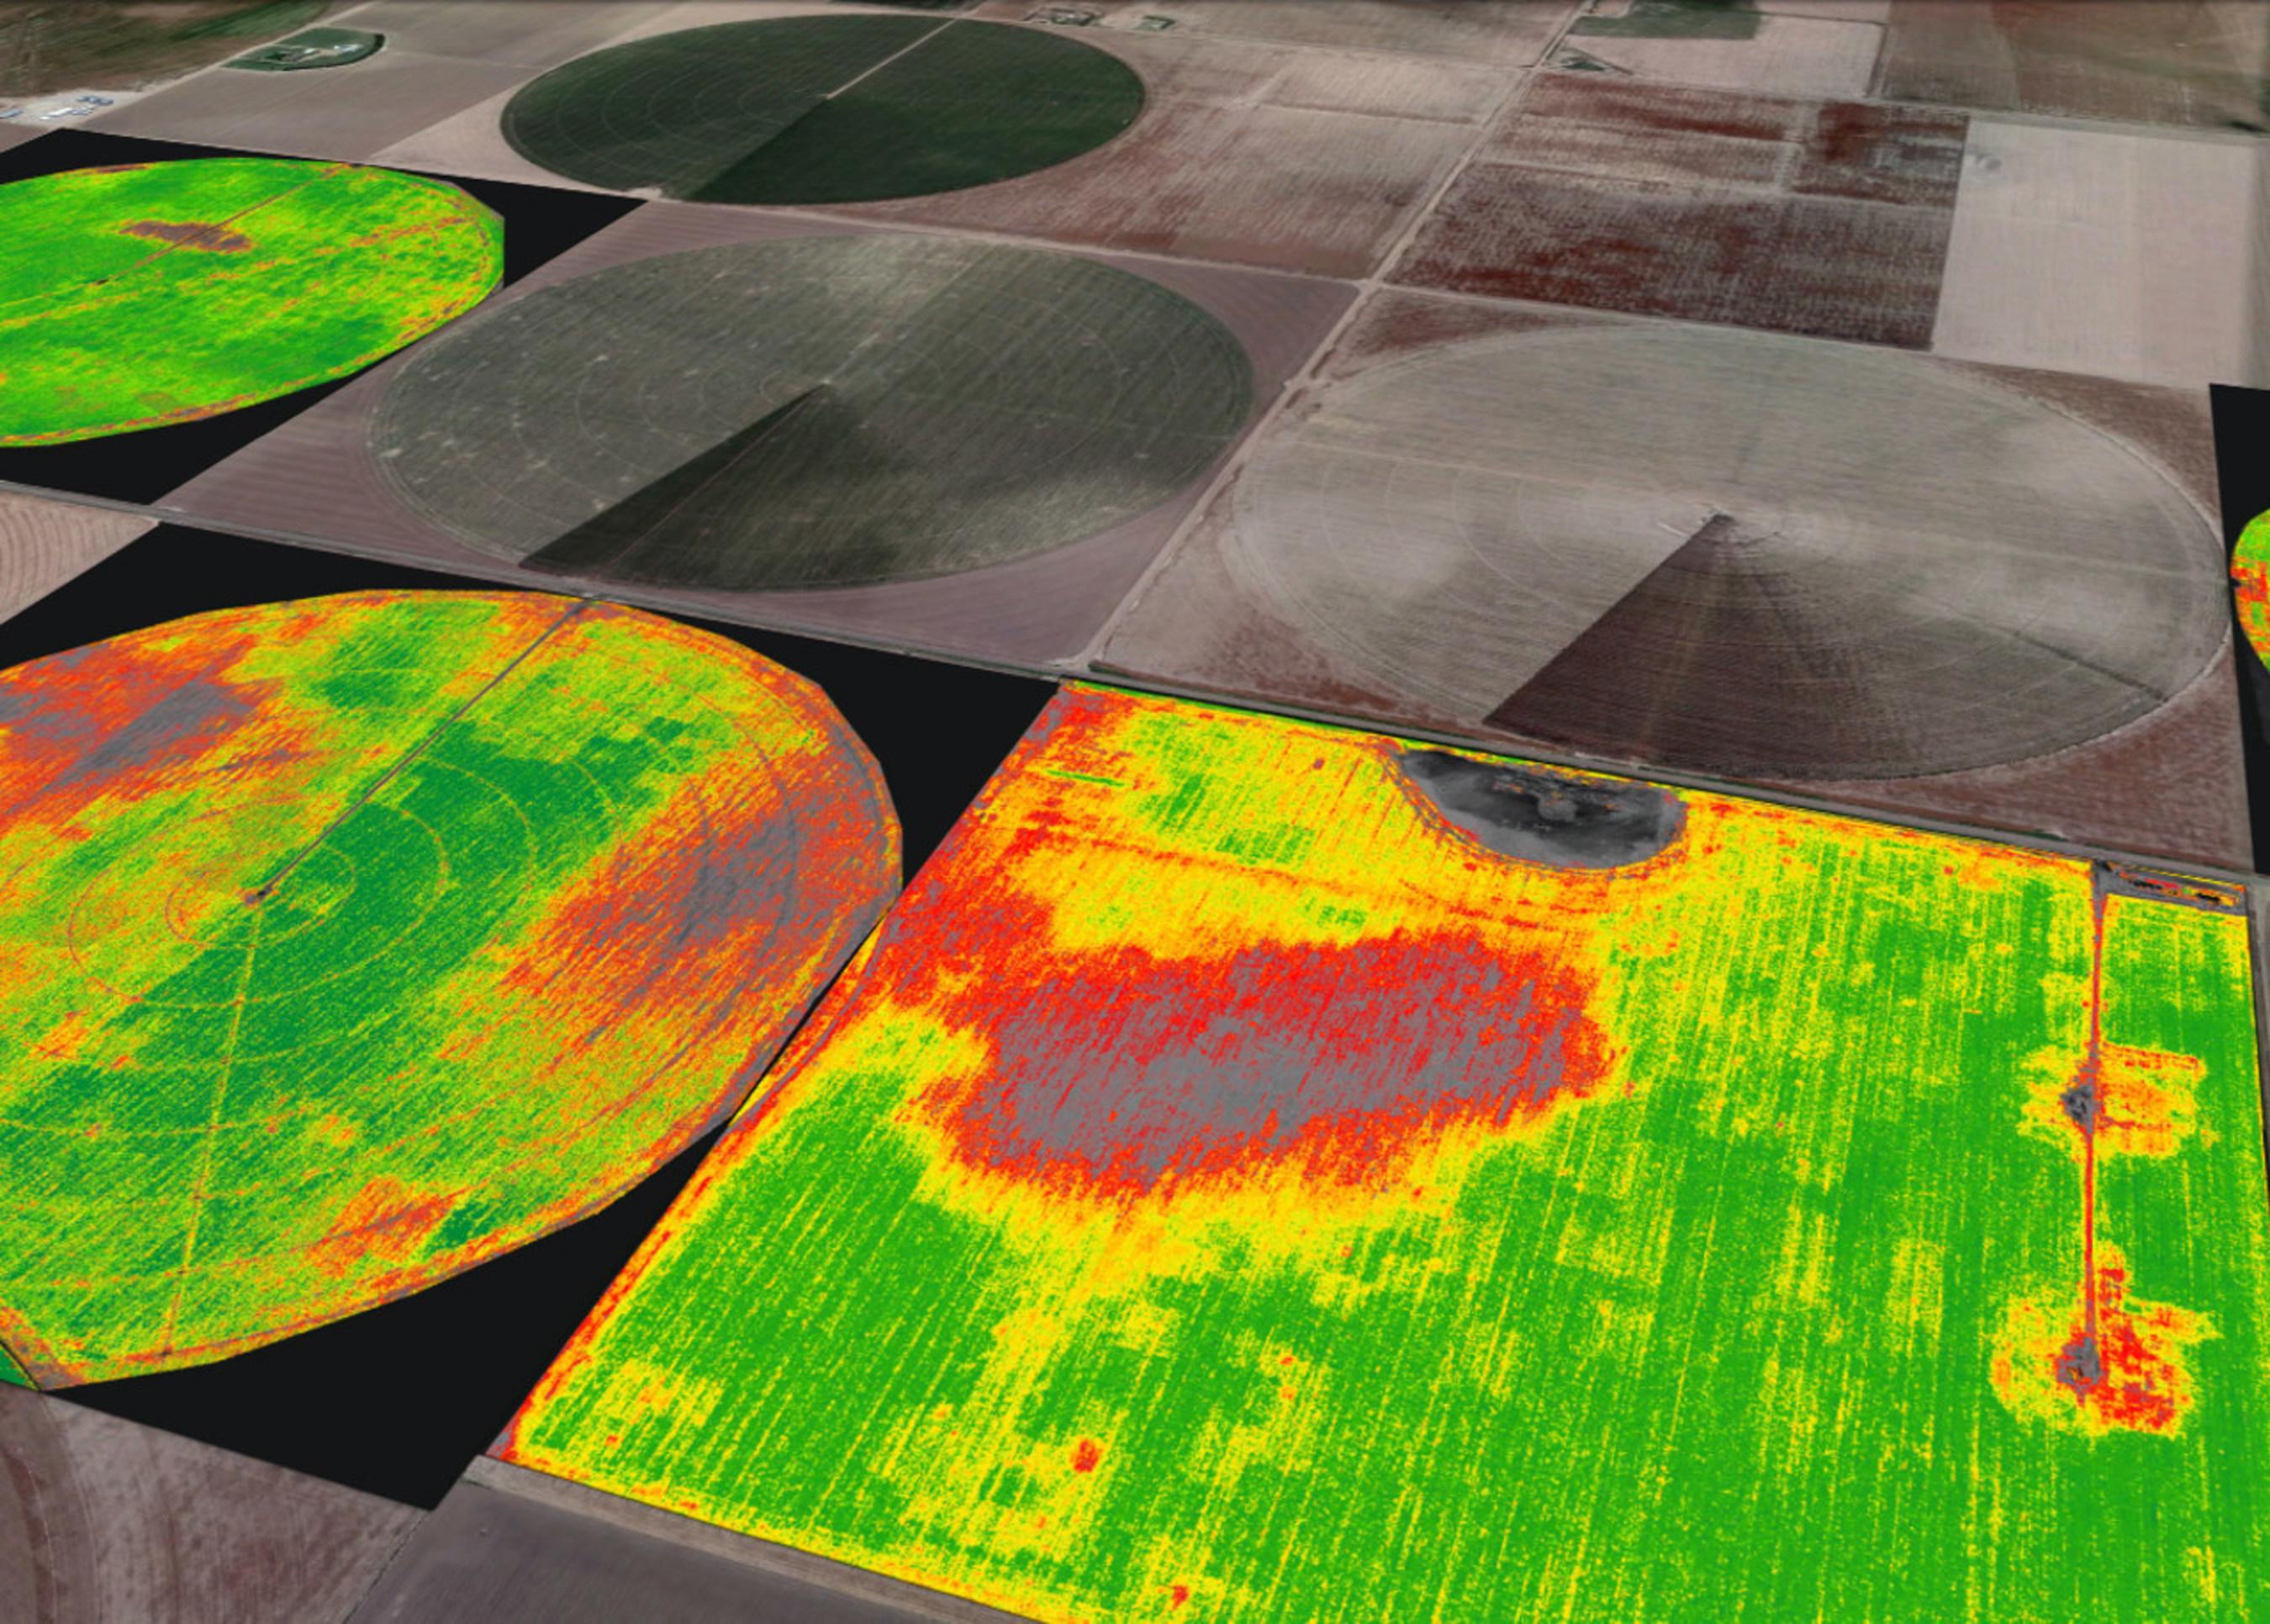 Agribotix - Hawkins Partnership Accelerates US Distribution For Drone-Enabled Agricultural